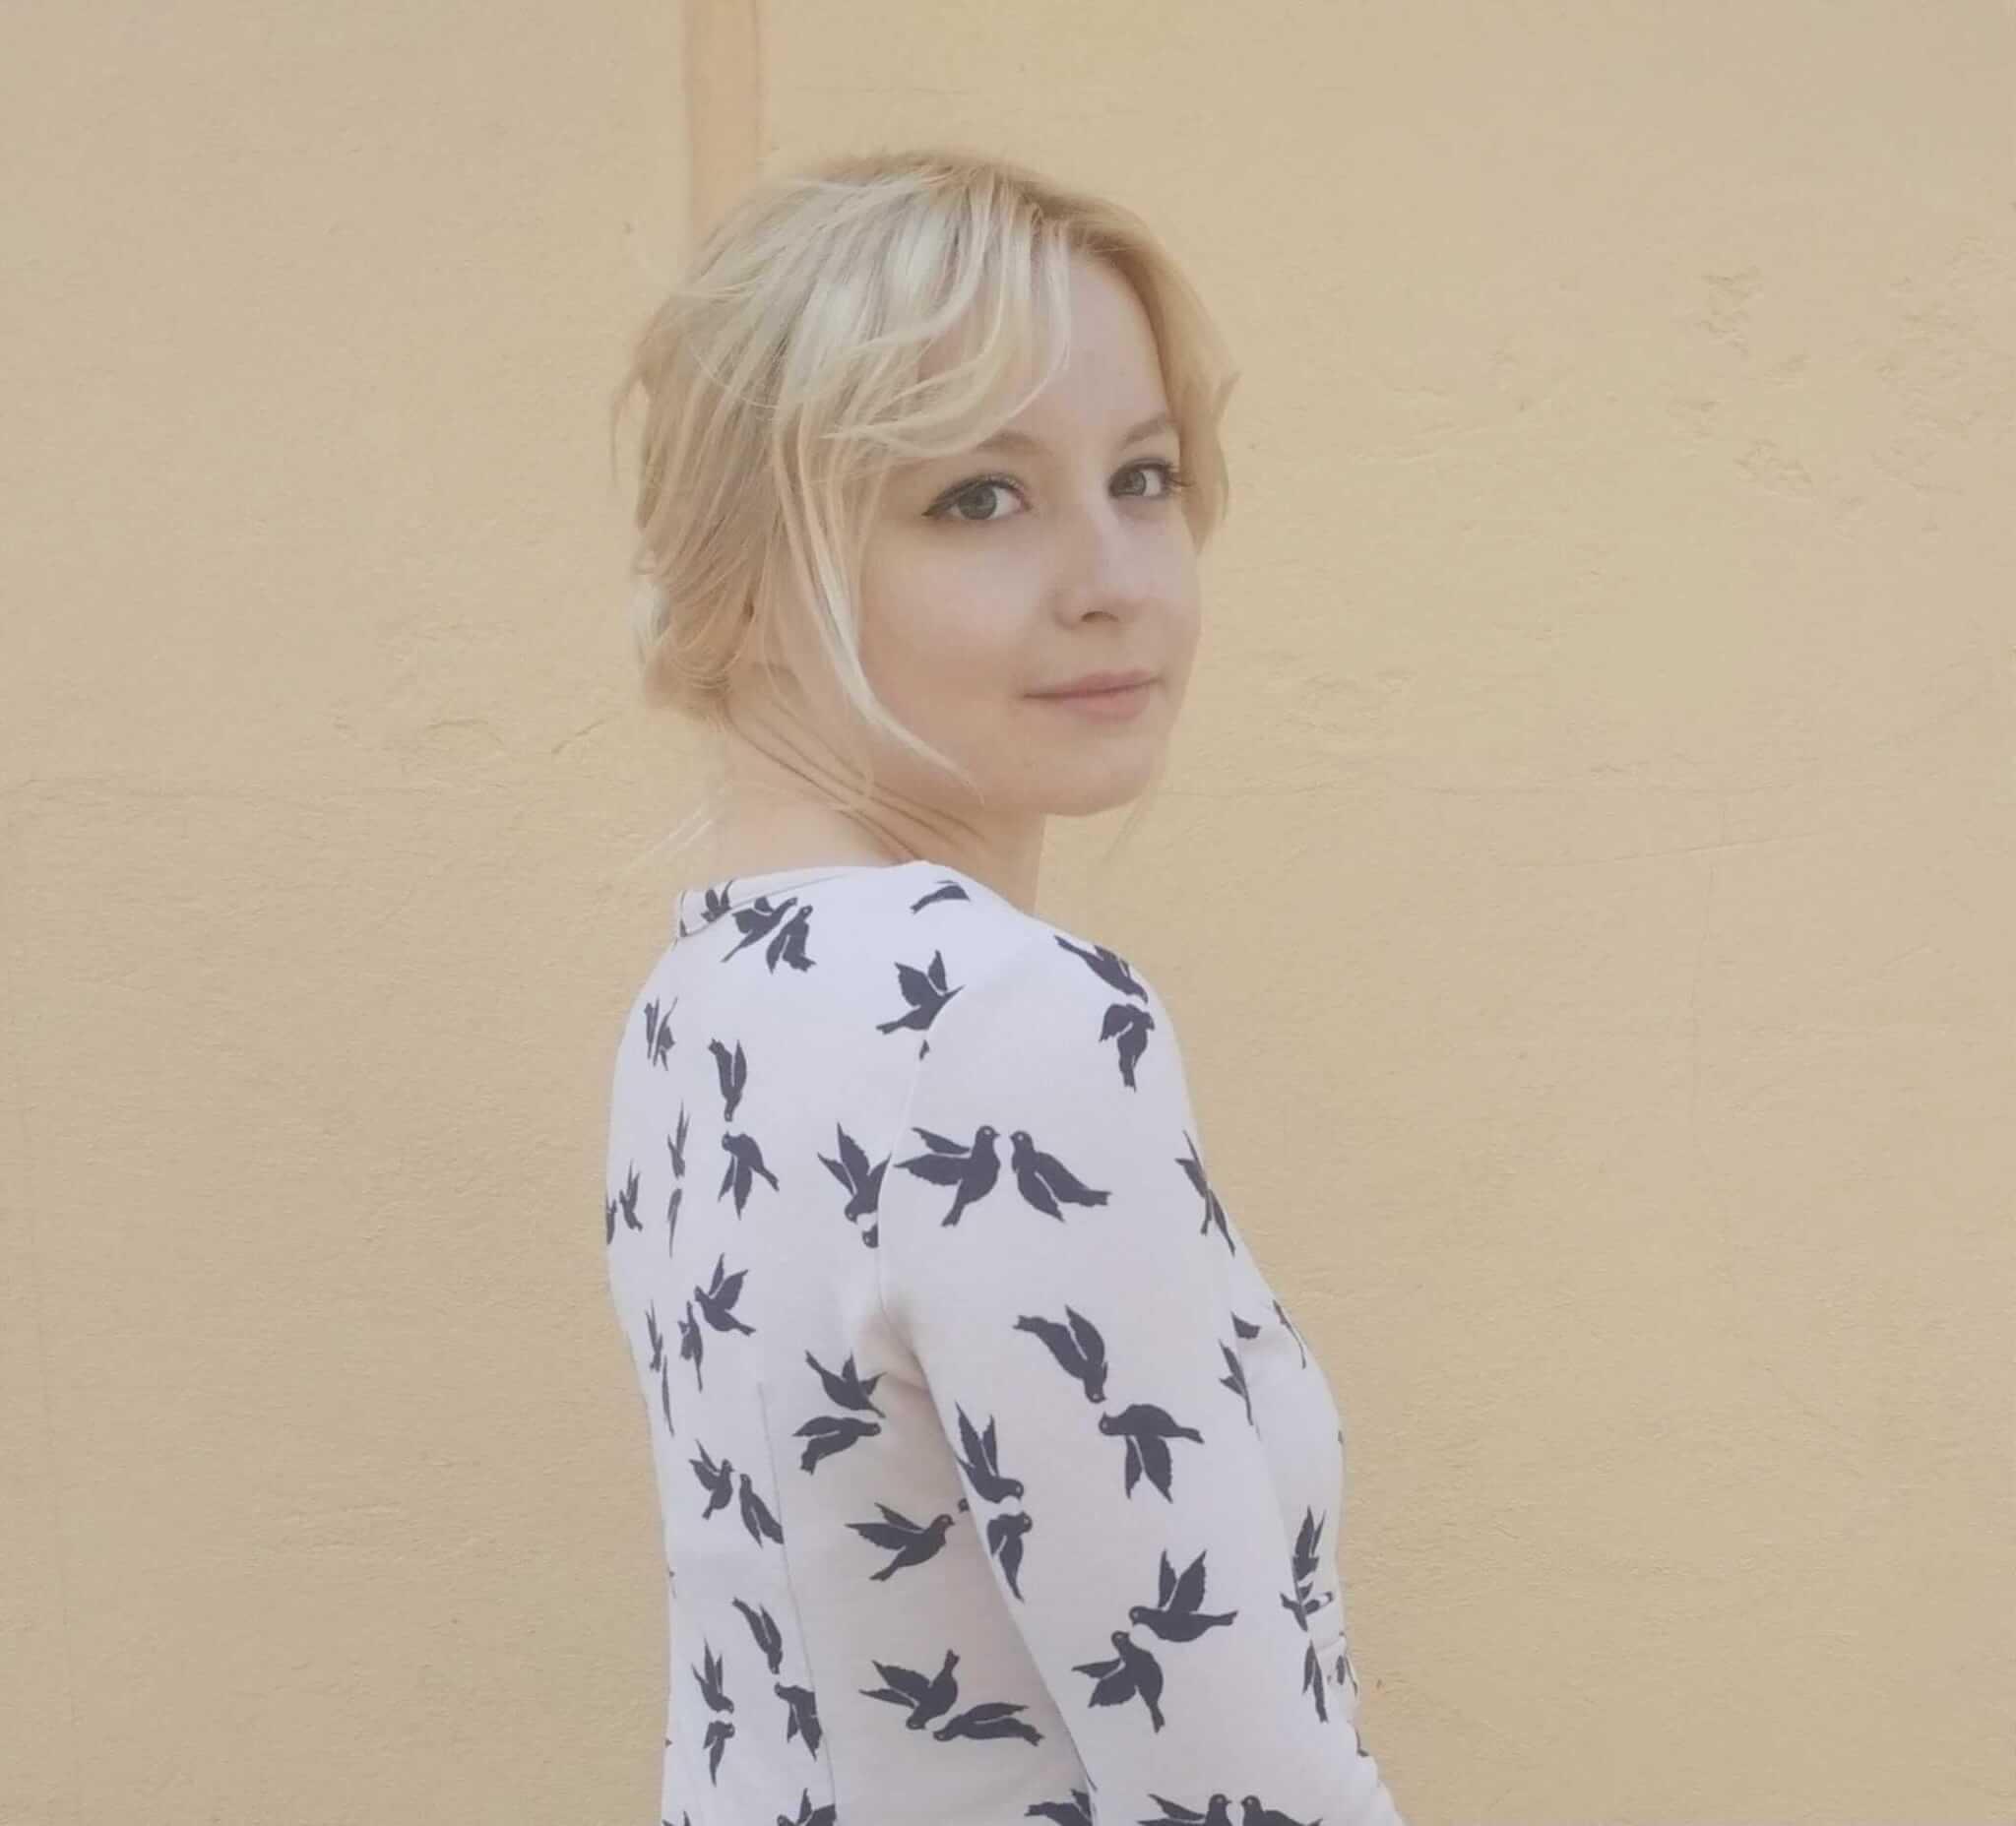 Mariia Chorna